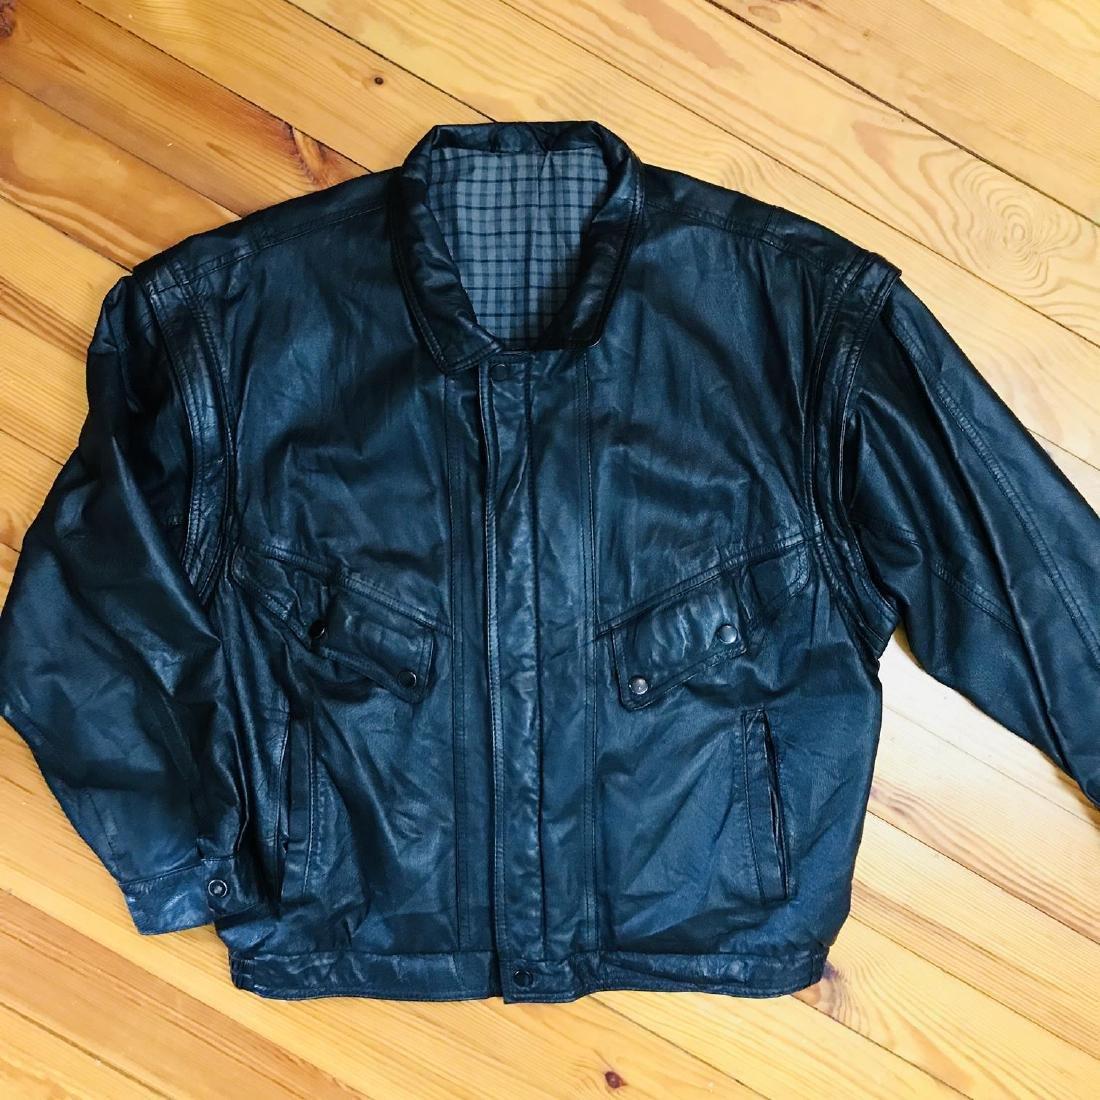 Vintage Men's Boecker Leather Jacket Size US 42 - 6